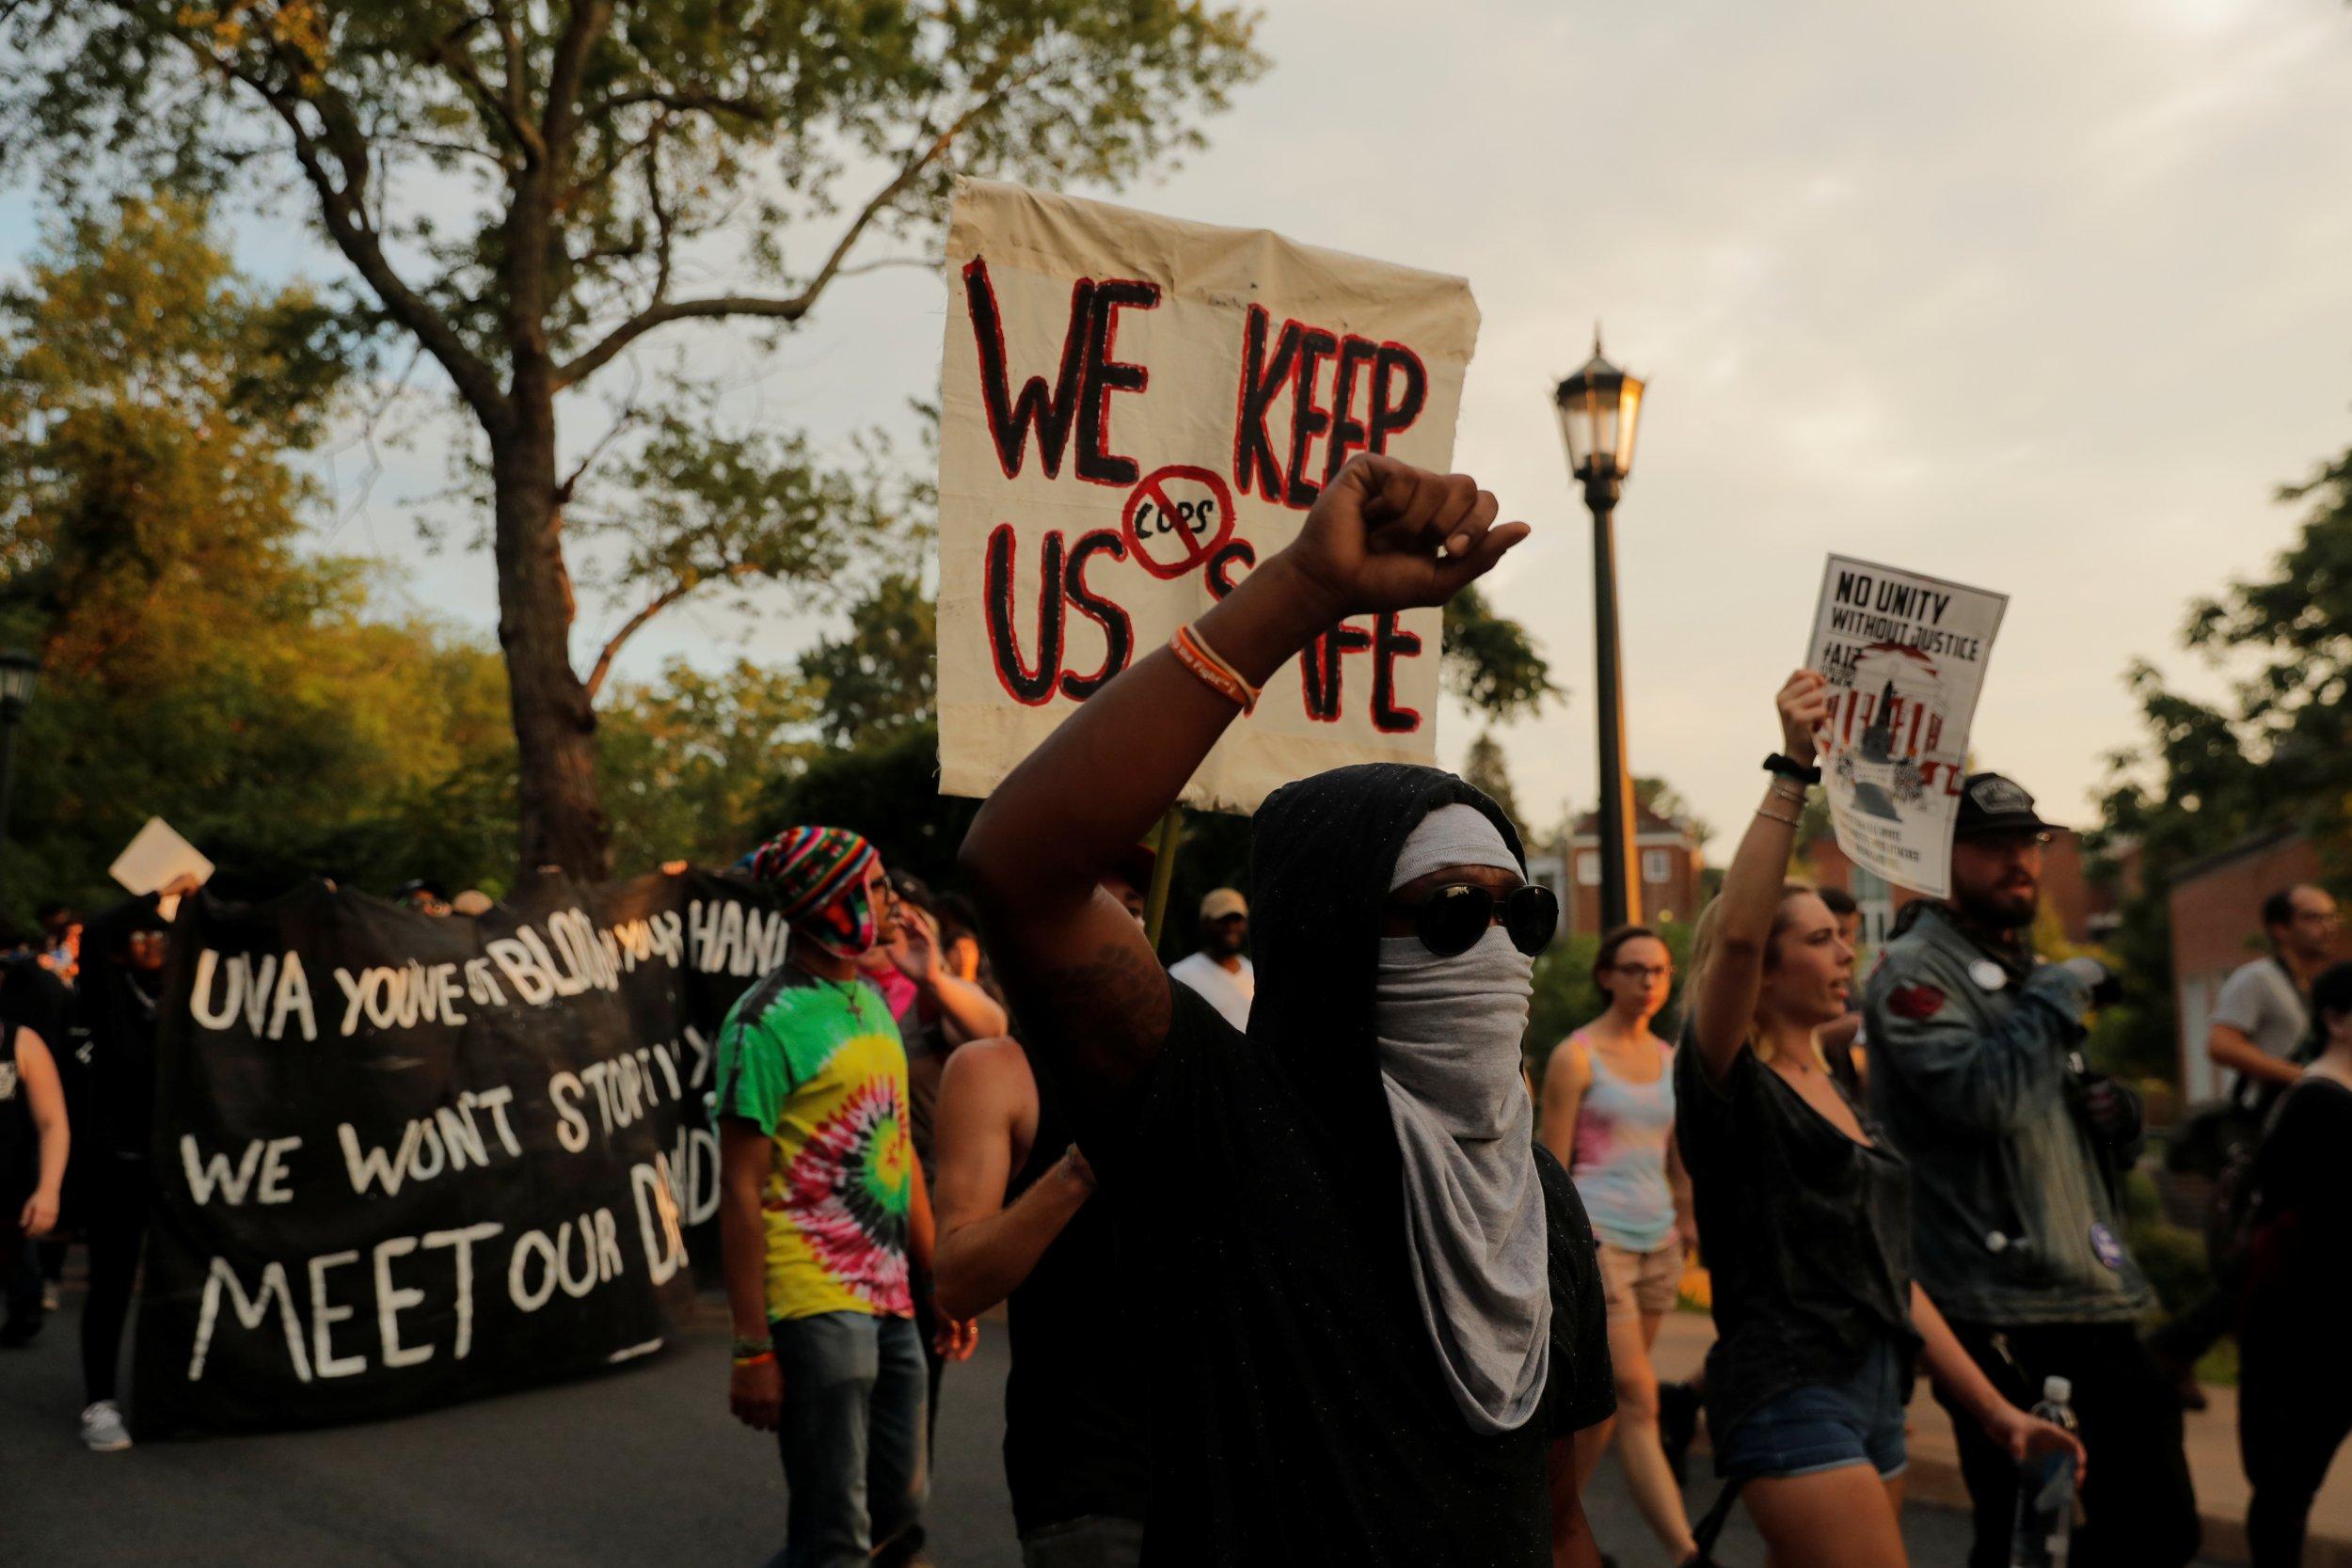 2018-08-12T030838Z_1_LYNXMPEE7B03I_RTROPTP_4_USA-PROTESTS